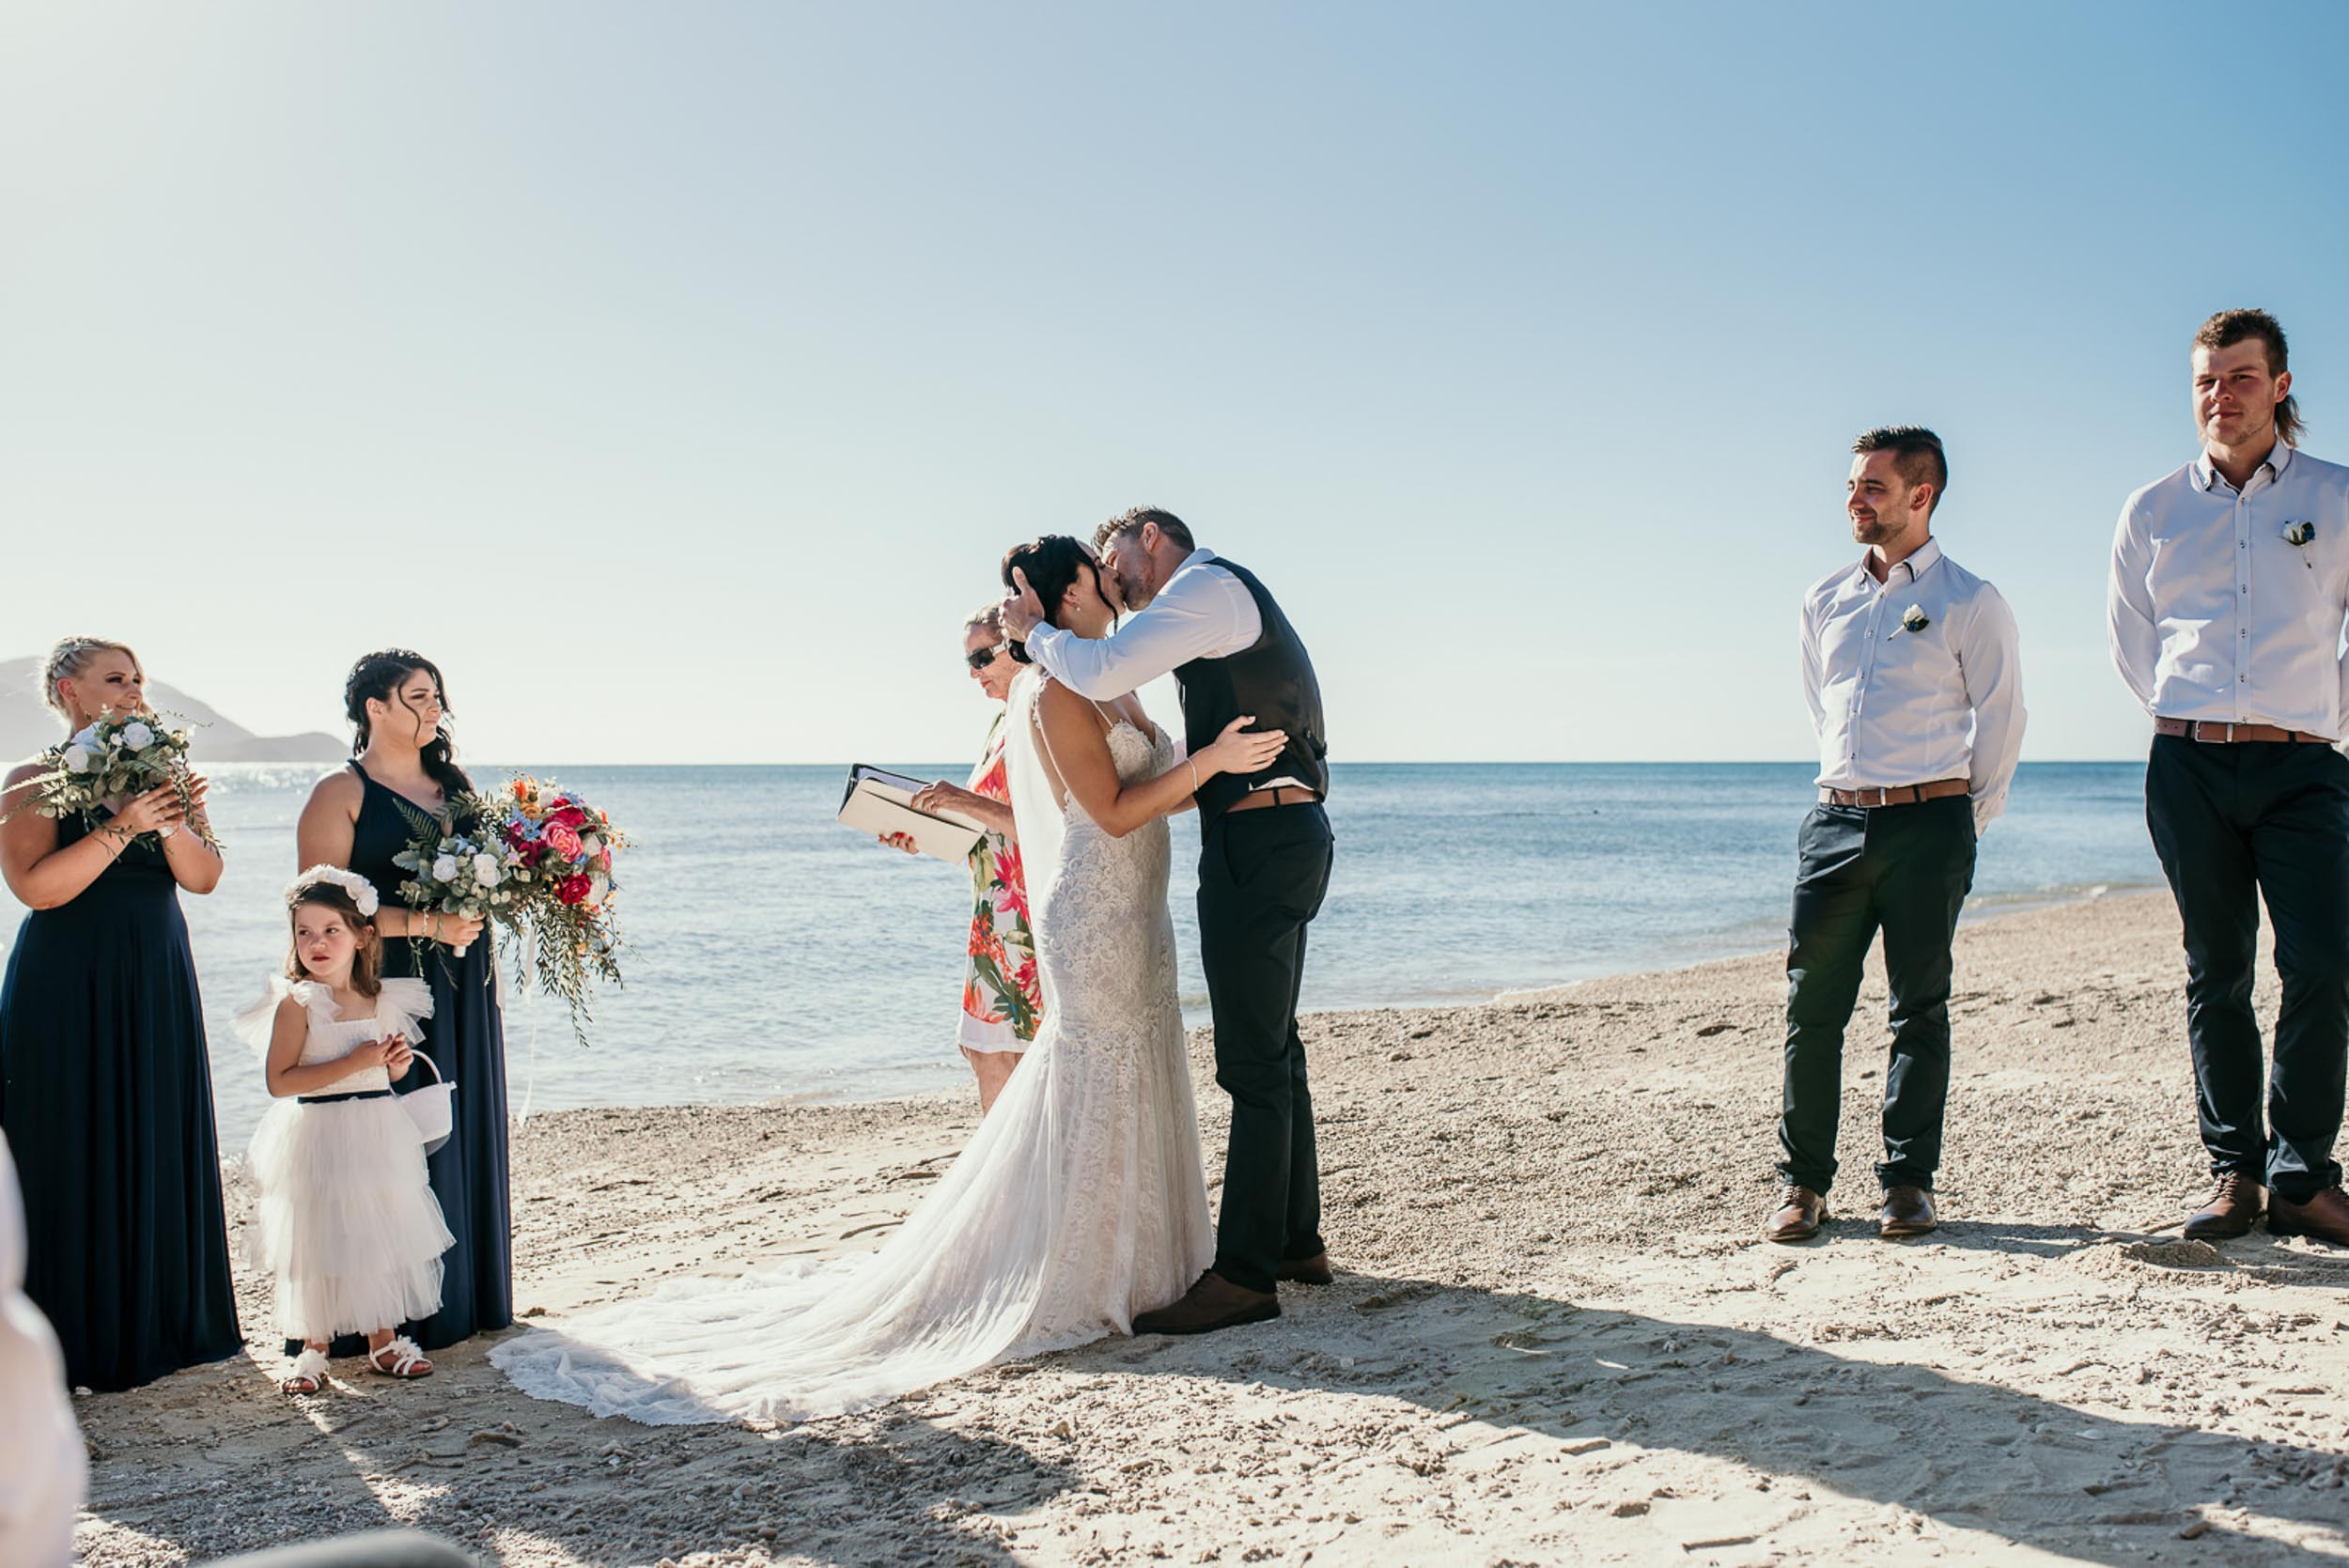 The Raw Photographer - Cairns Wedding Photographer - Fitzroy Island - Destination Wedding - Bride Dress - Groom Portrait - Queensland-24.jpg